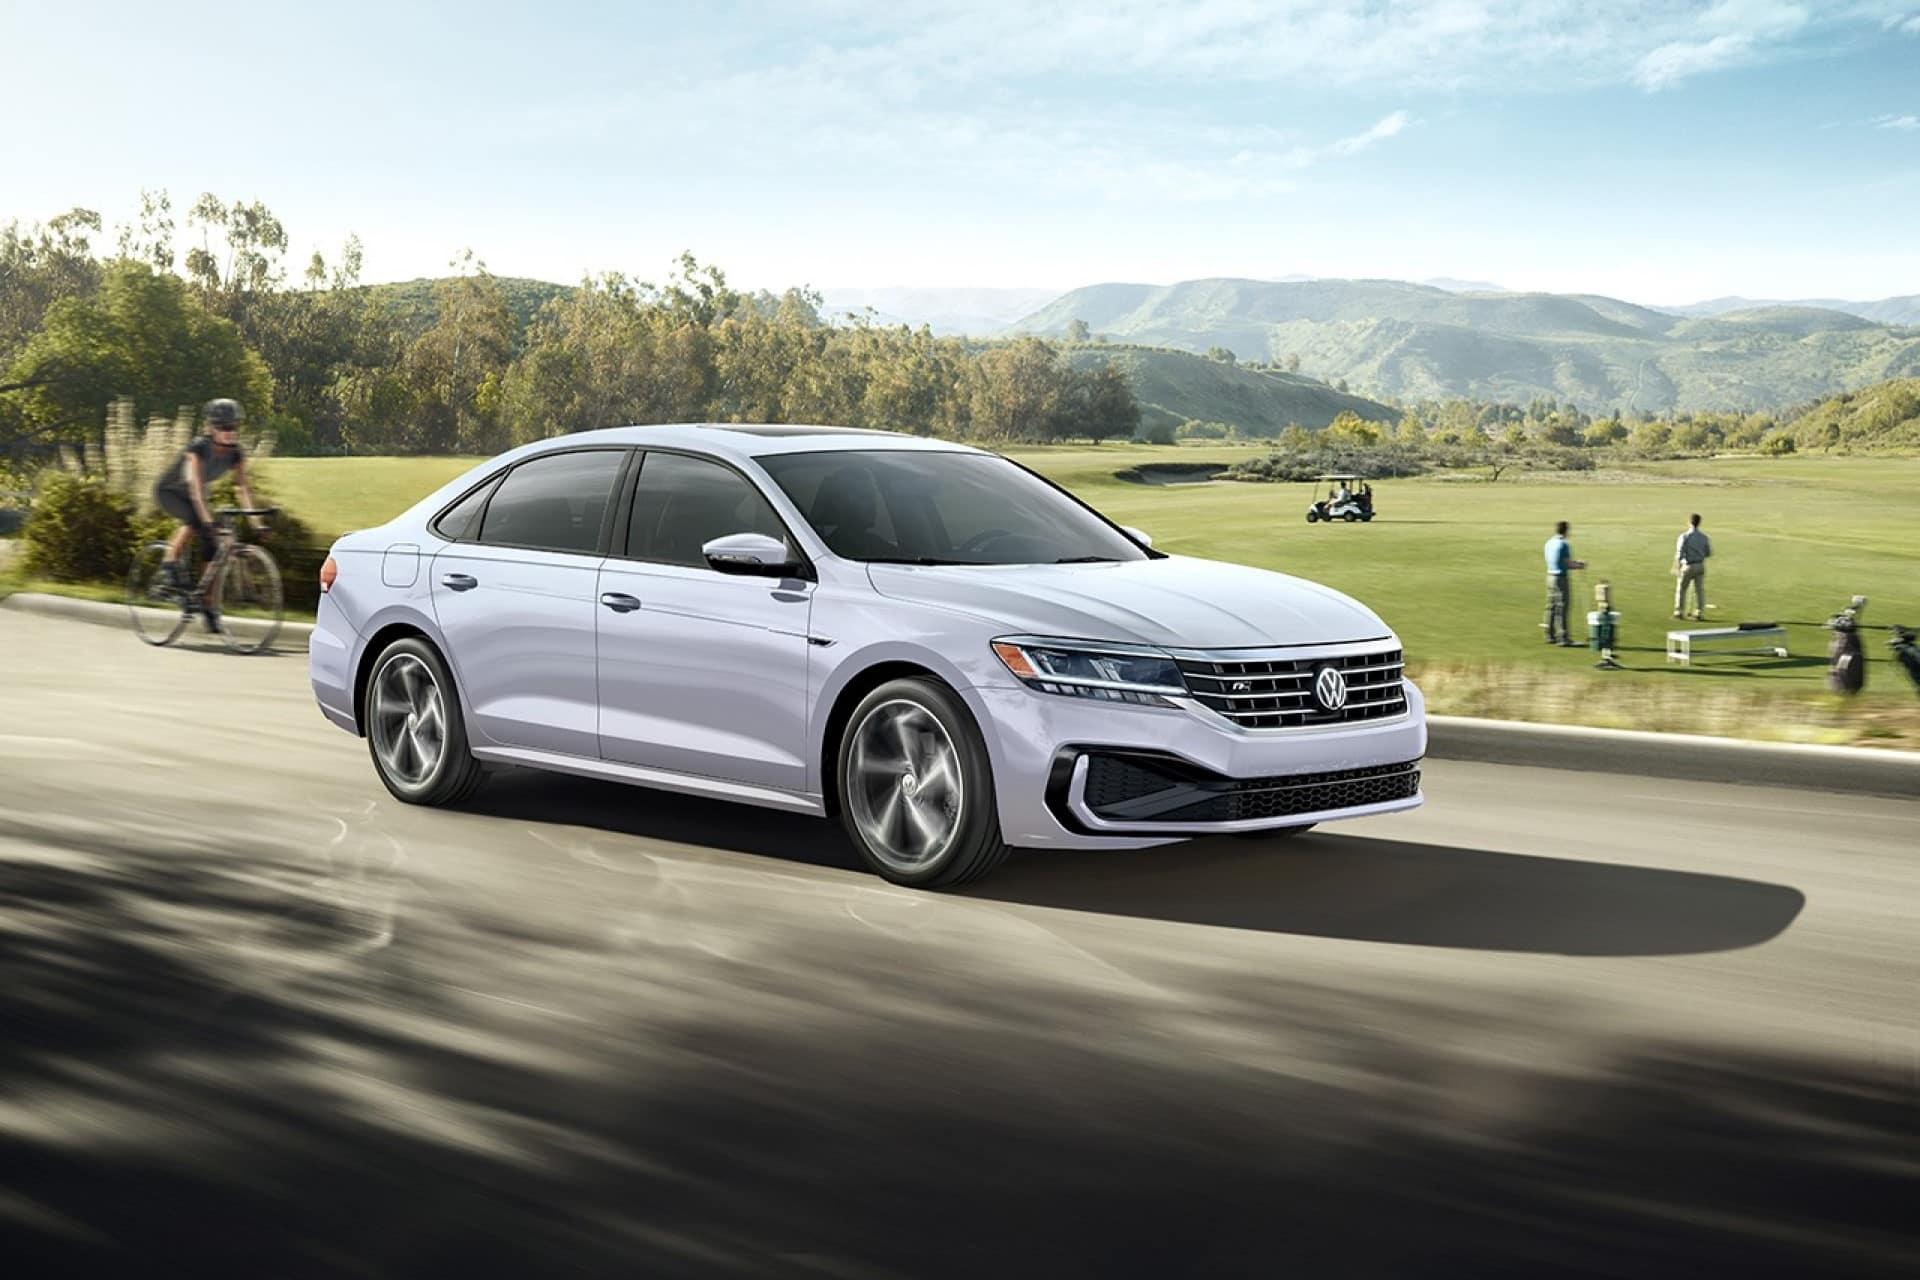 VW_Passat_Silver_Driving_Suburban